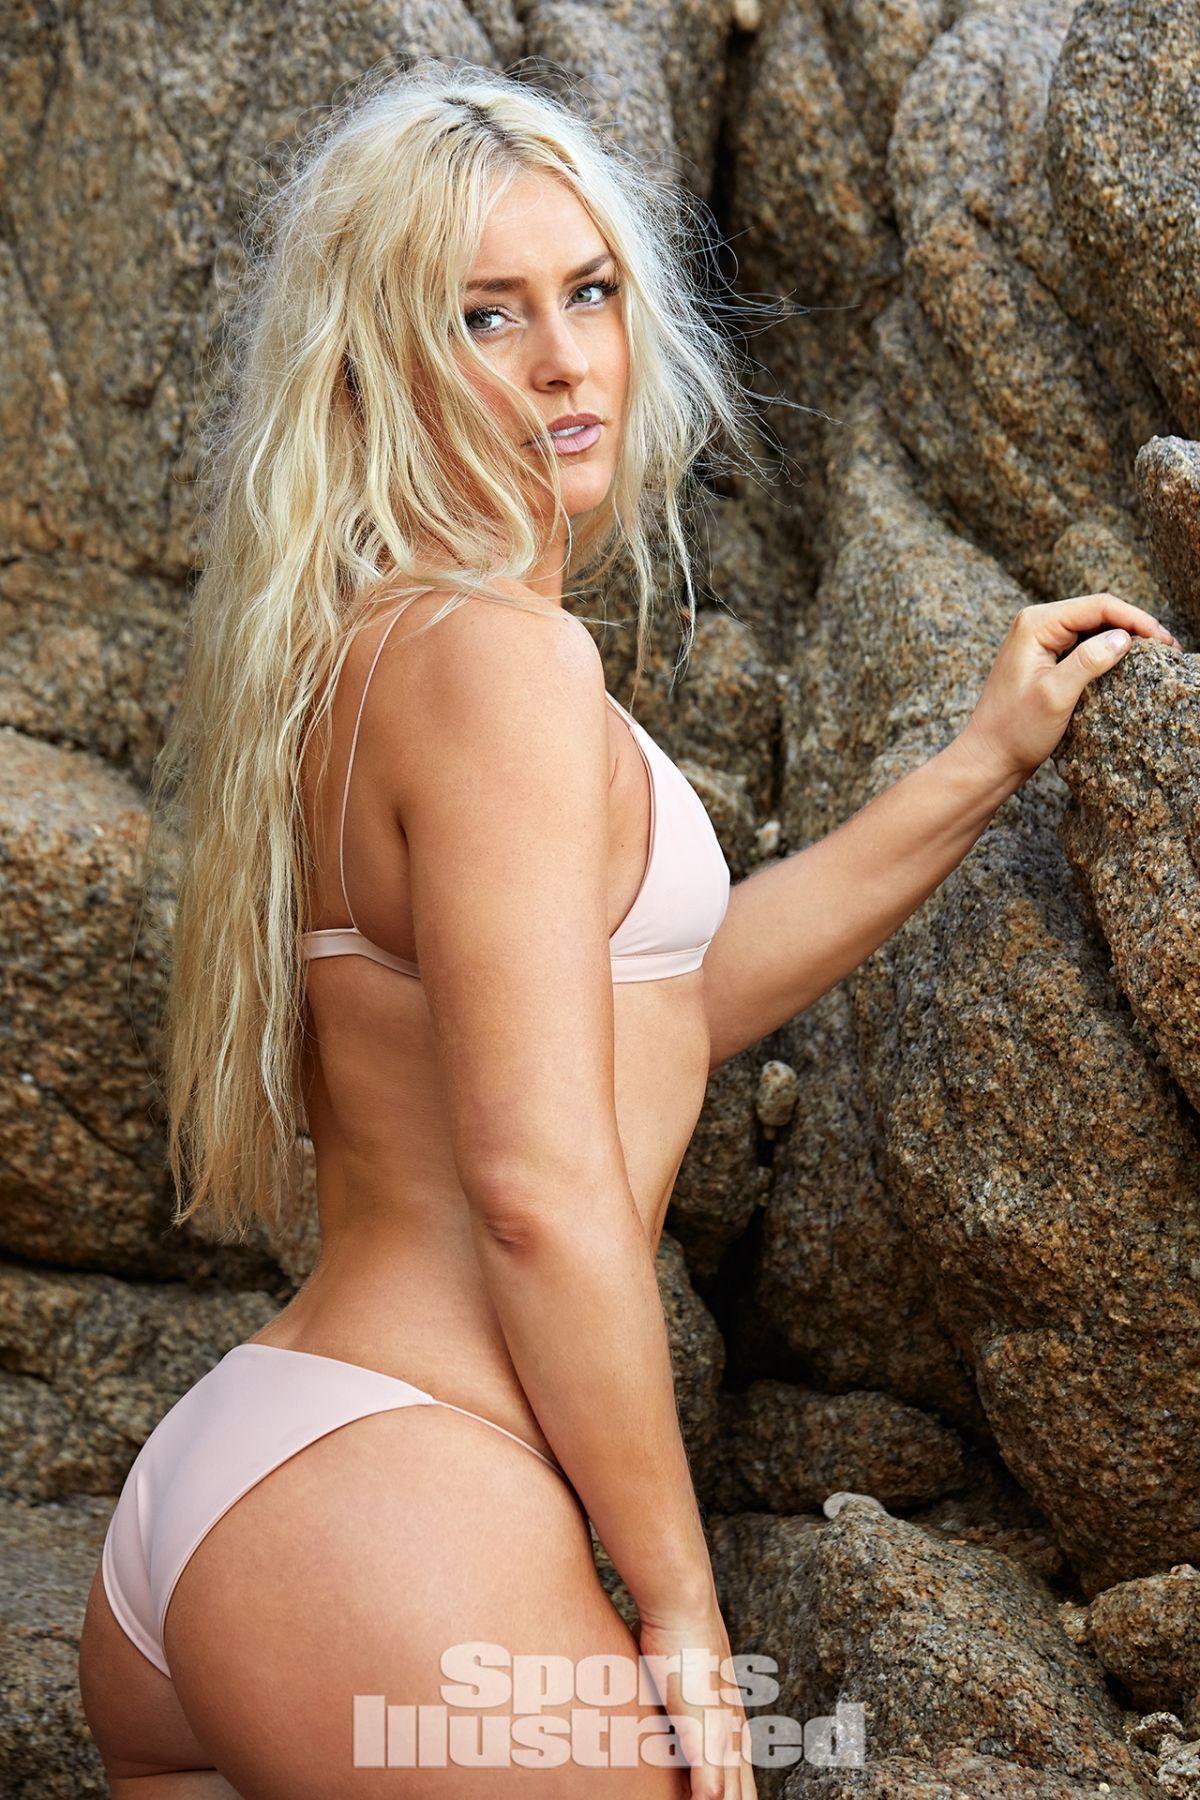 Nacktbilder Unzensiert